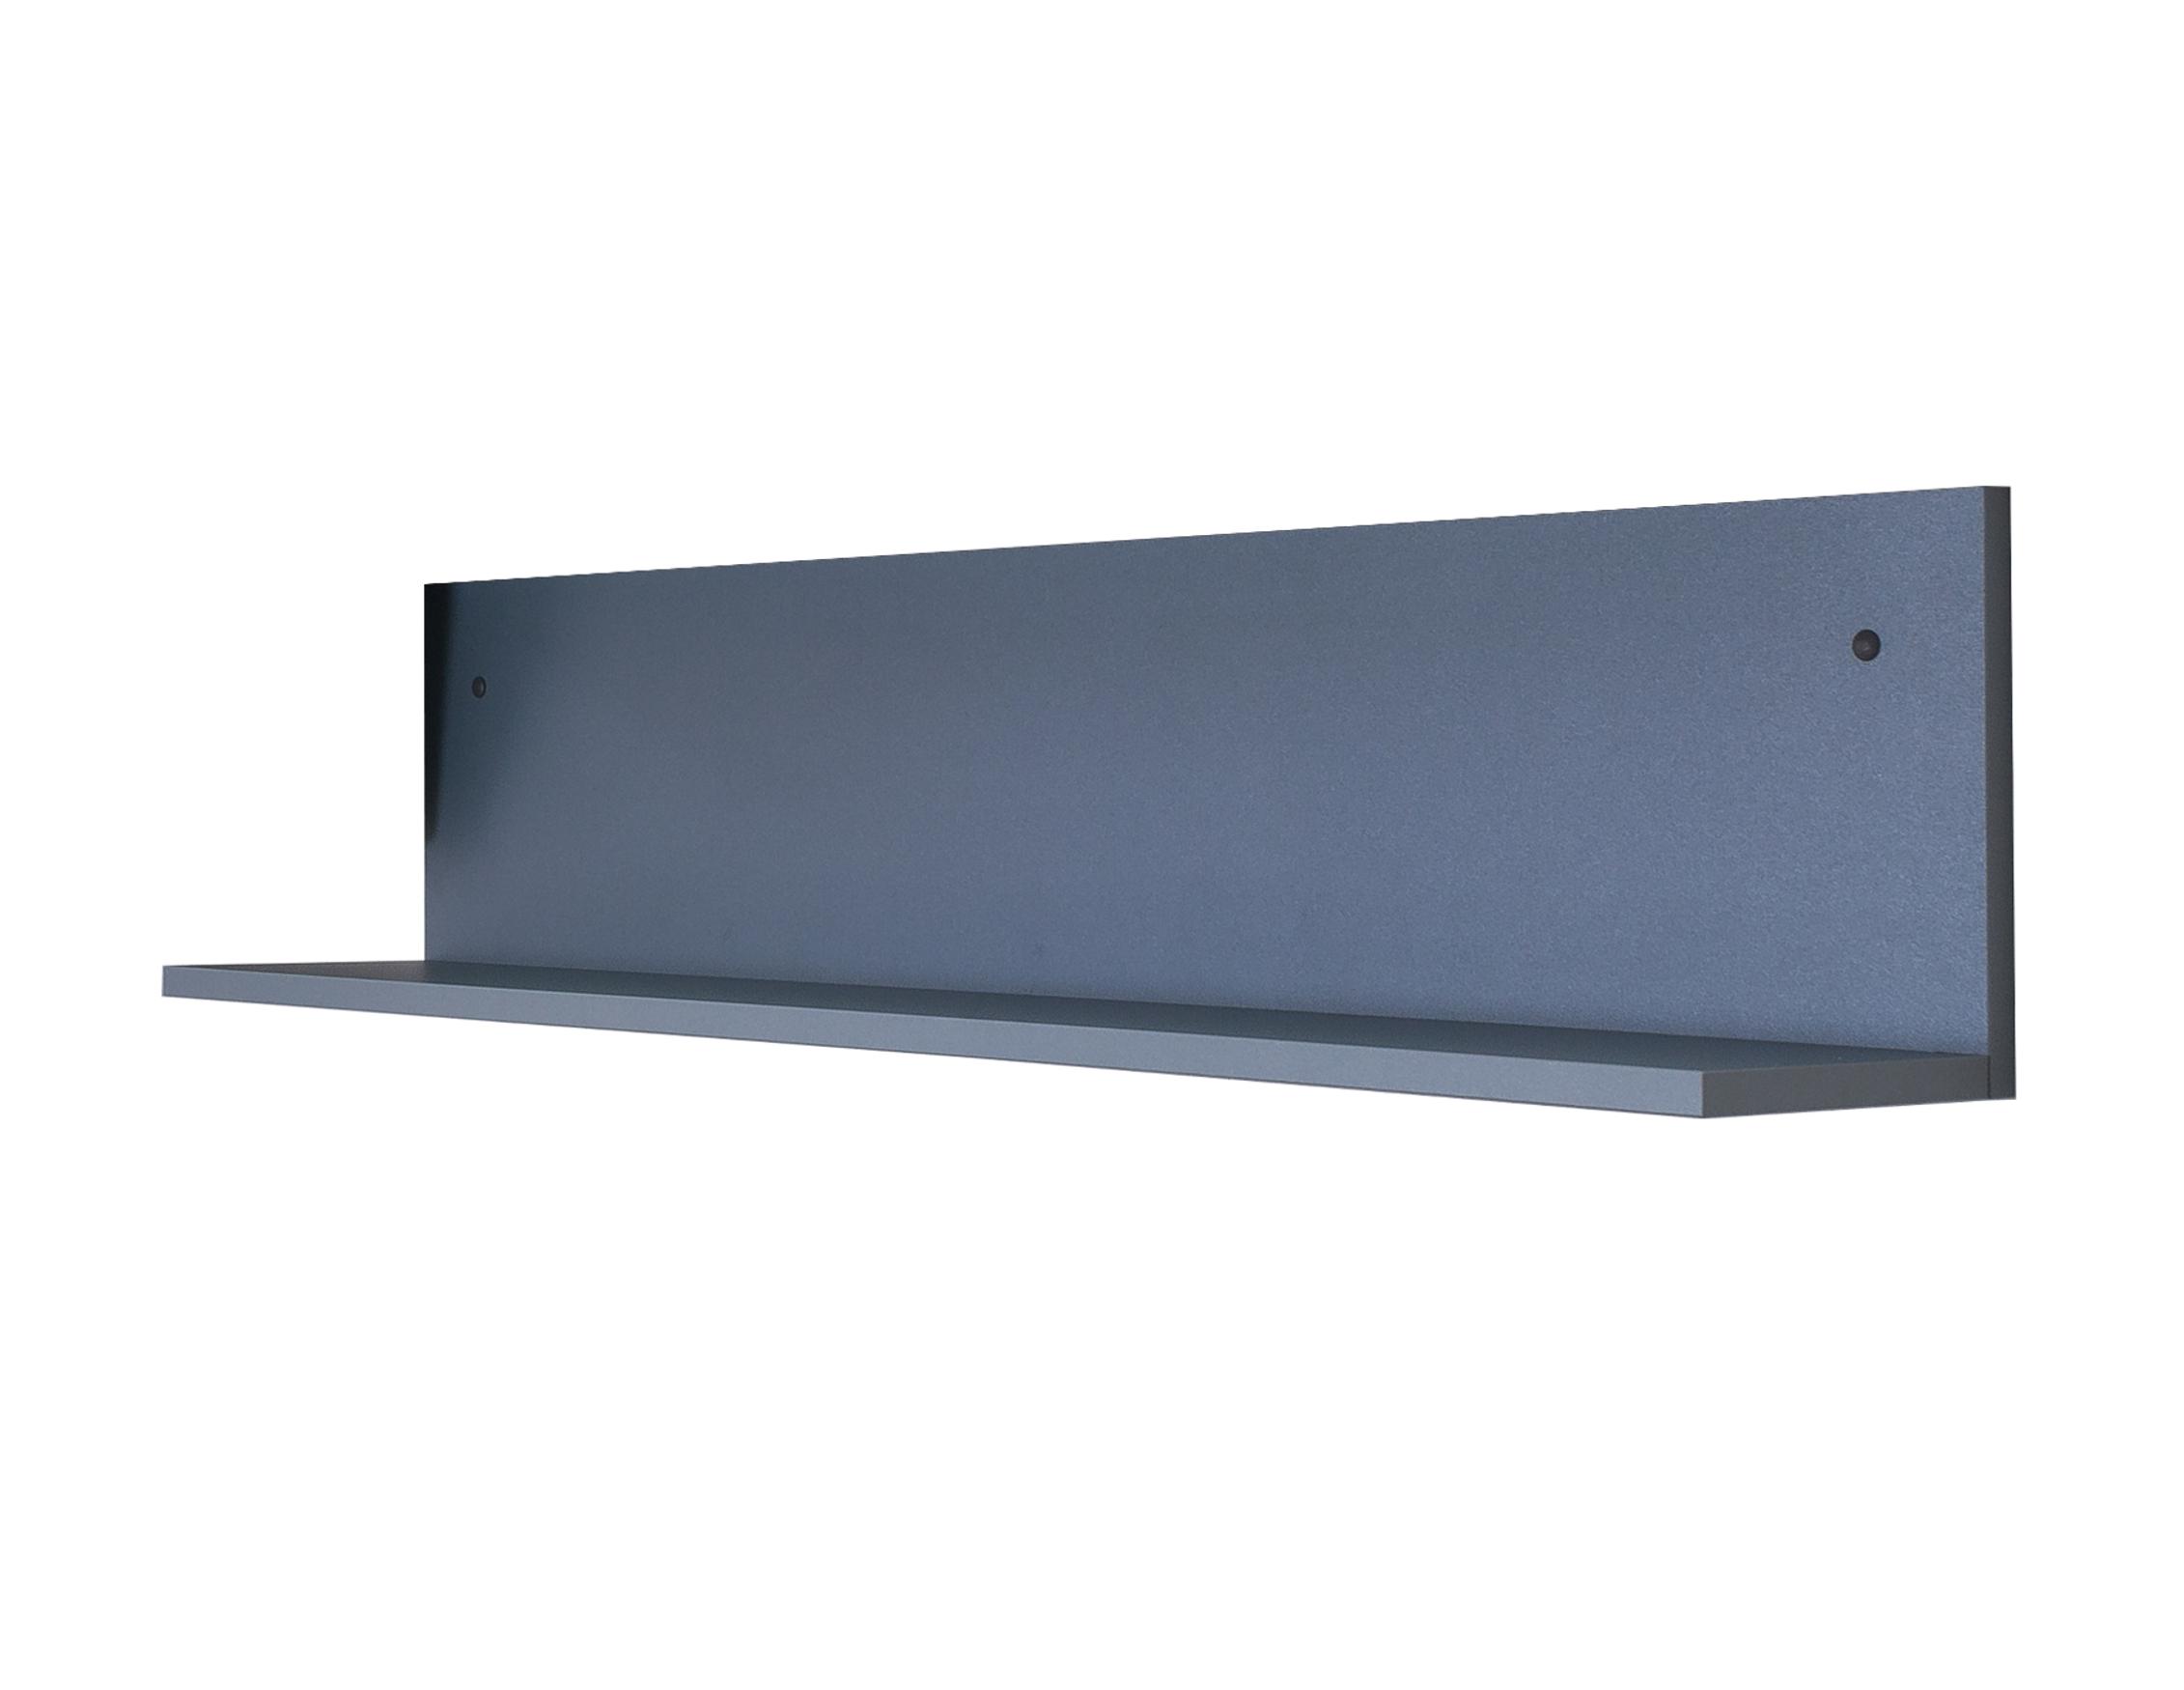 wandregal 40 cm breit wandregal kiddy 40 cm breit wei. Black Bedroom Furniture Sets. Home Design Ideas